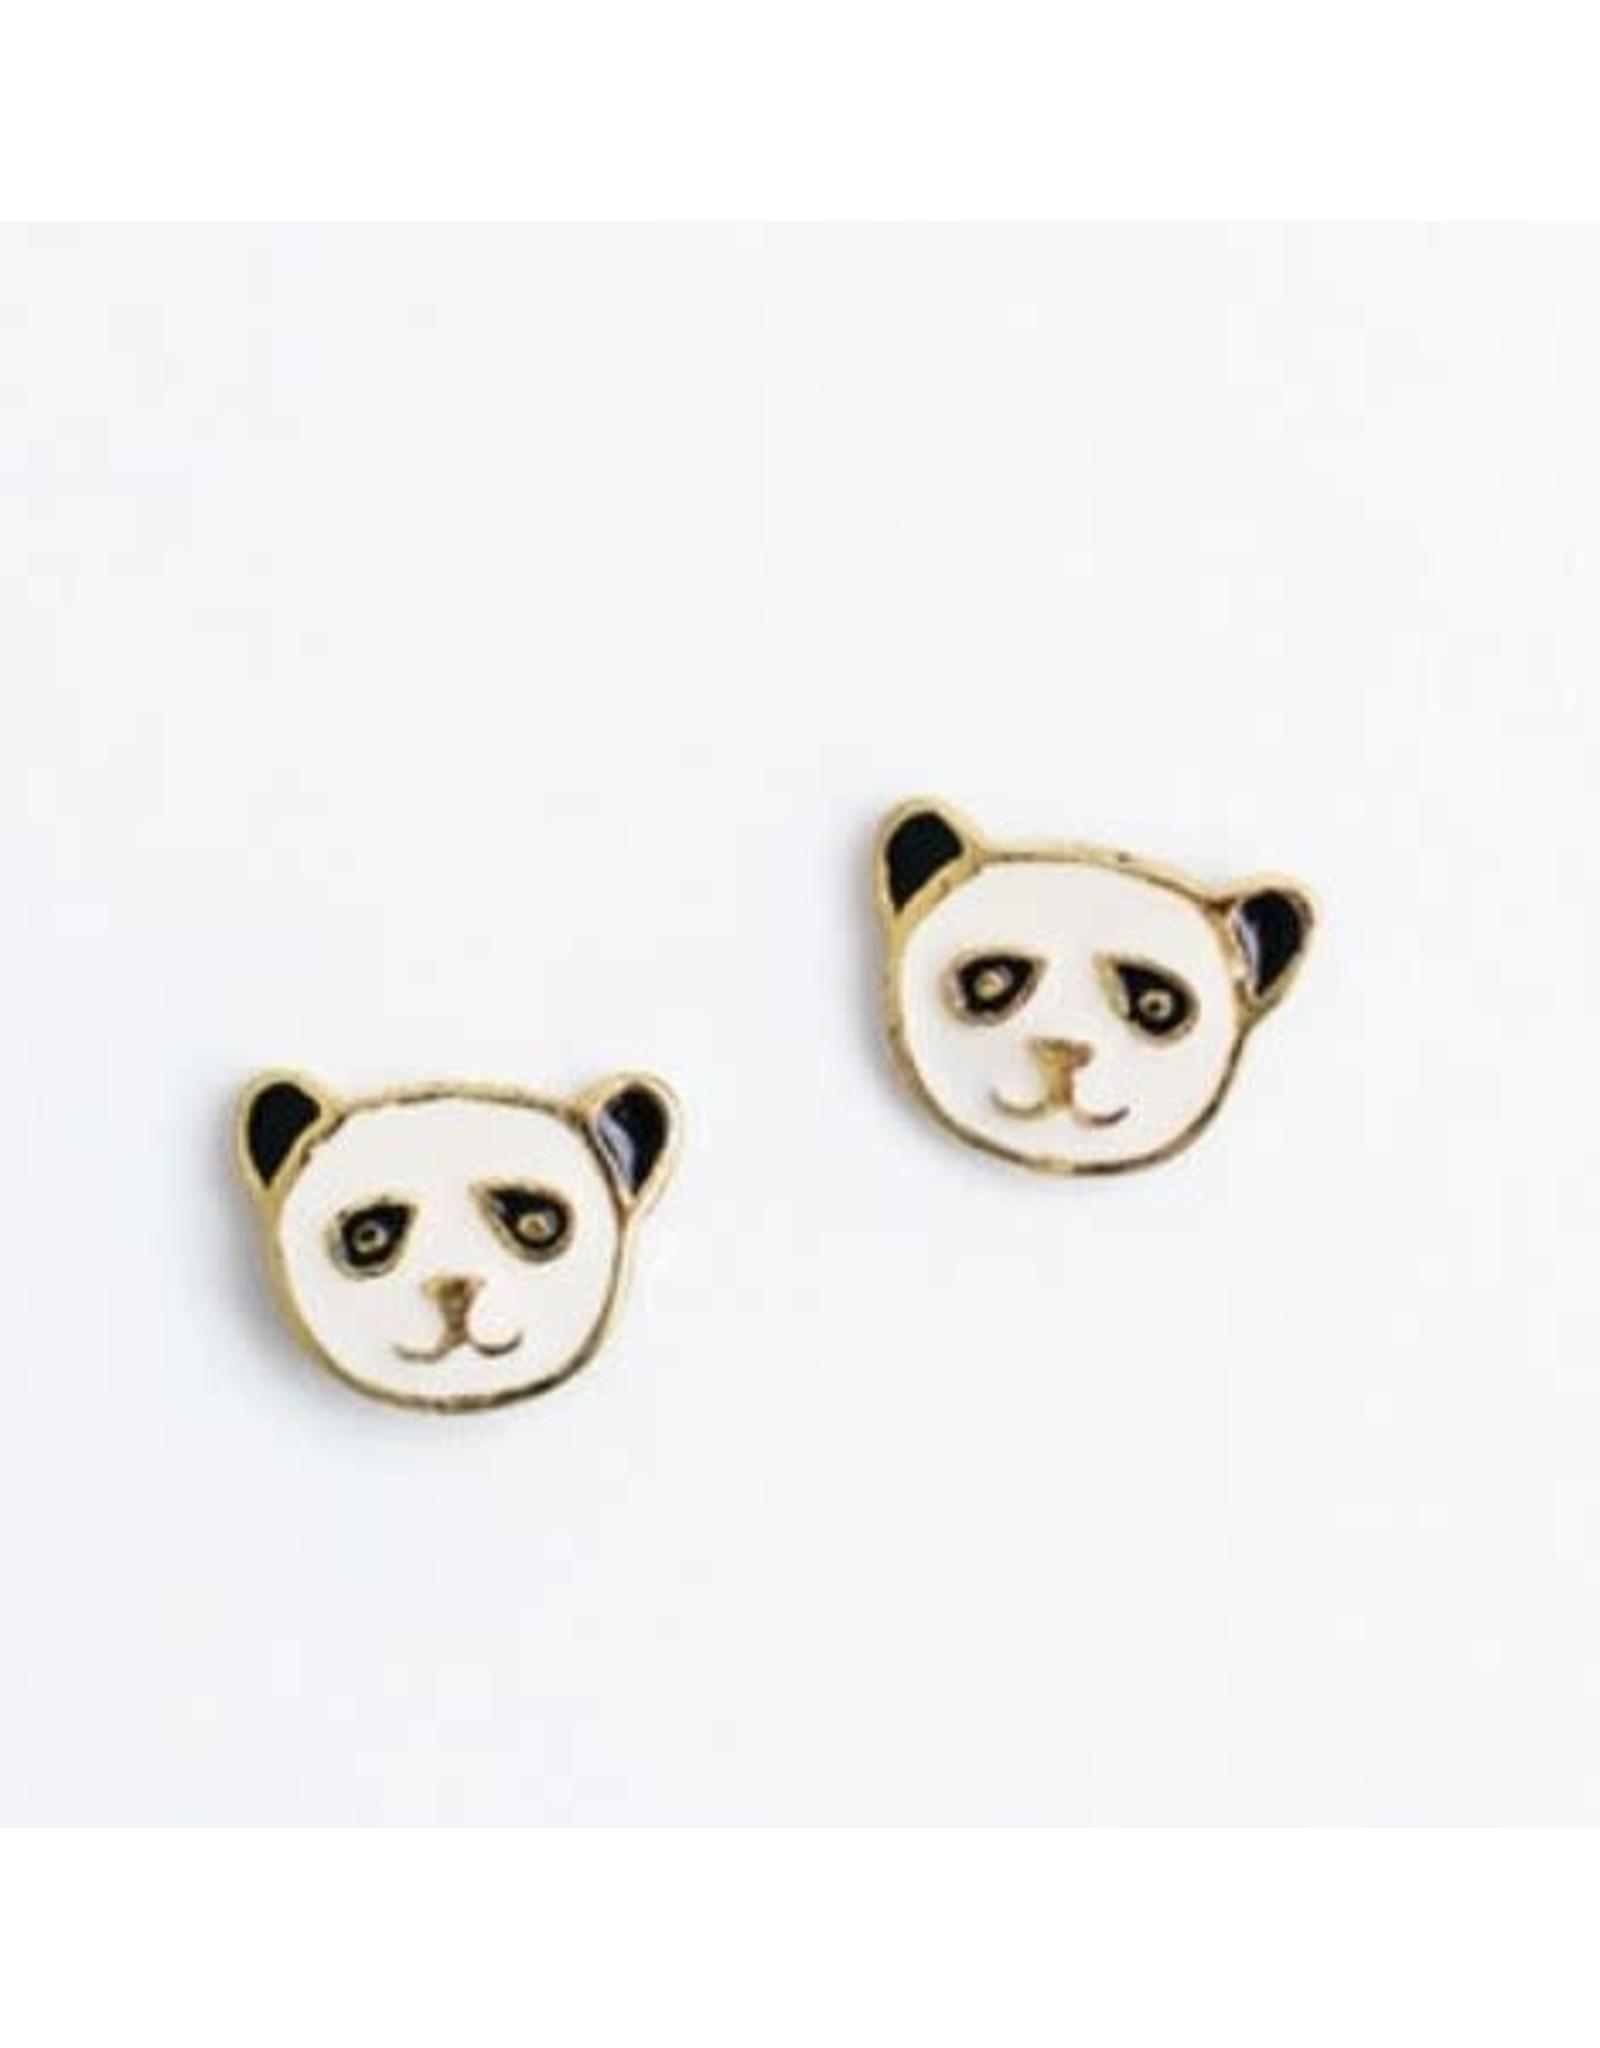 Panda Studs. India